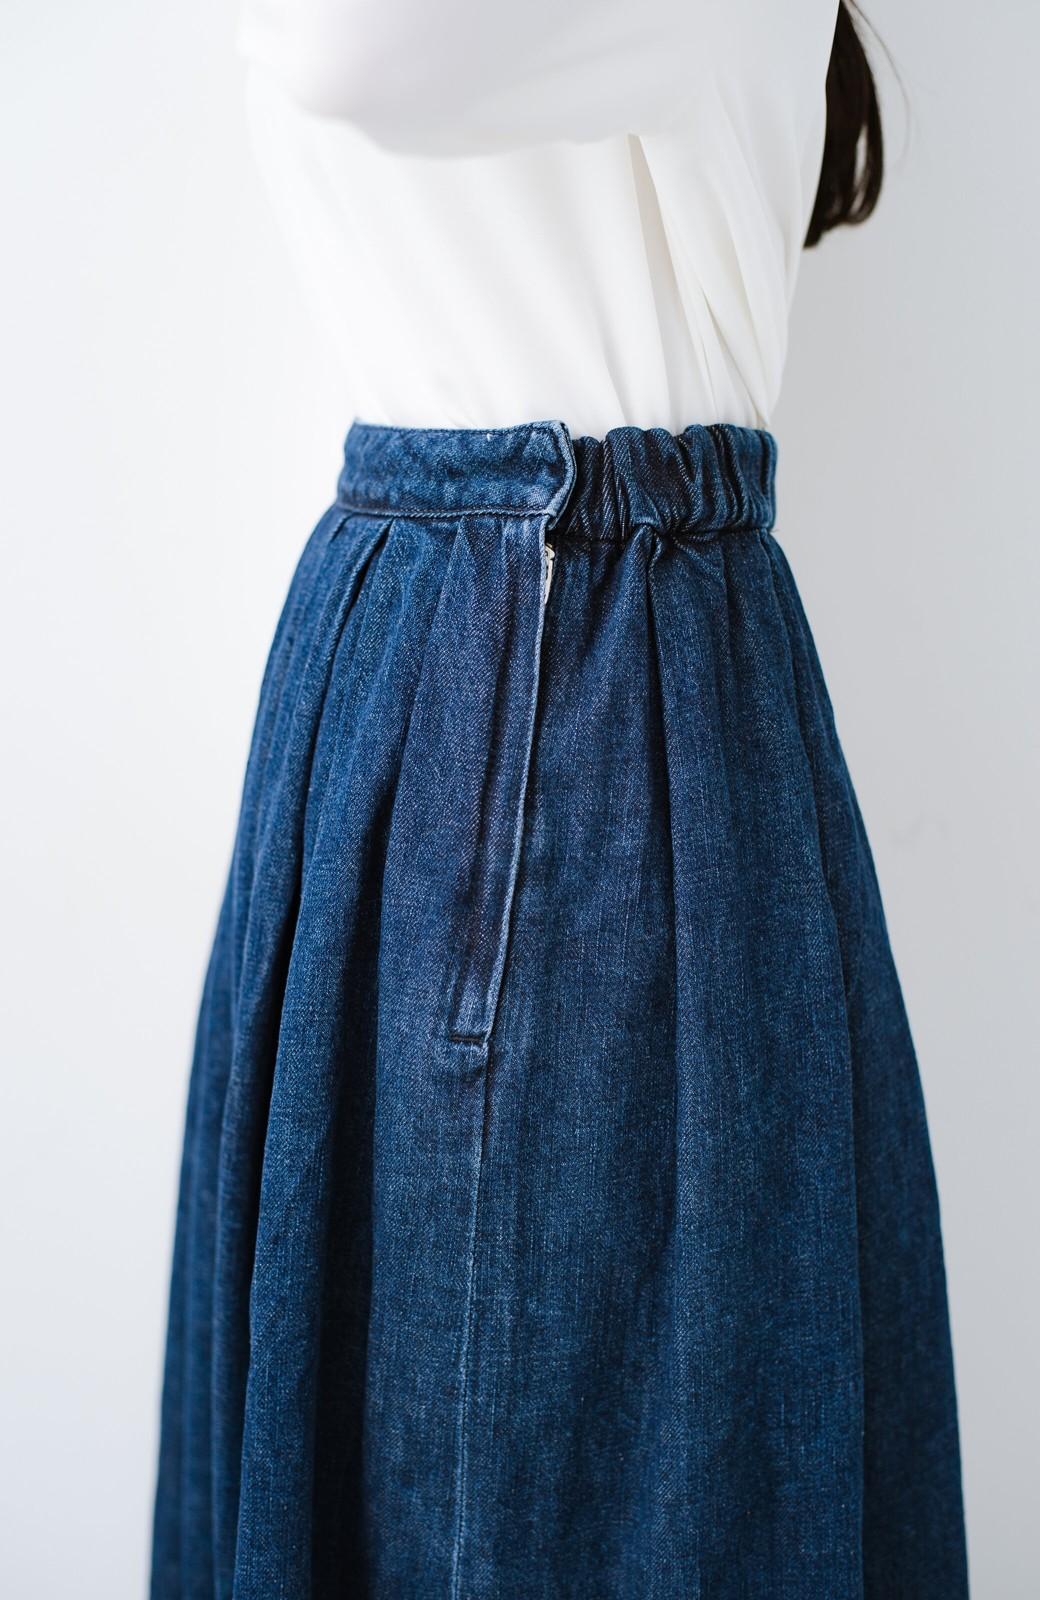 haco! Urvin 伊藤信子×sayurinishikuboコラボ tann'sスカート <インディゴブルー>の商品写真6